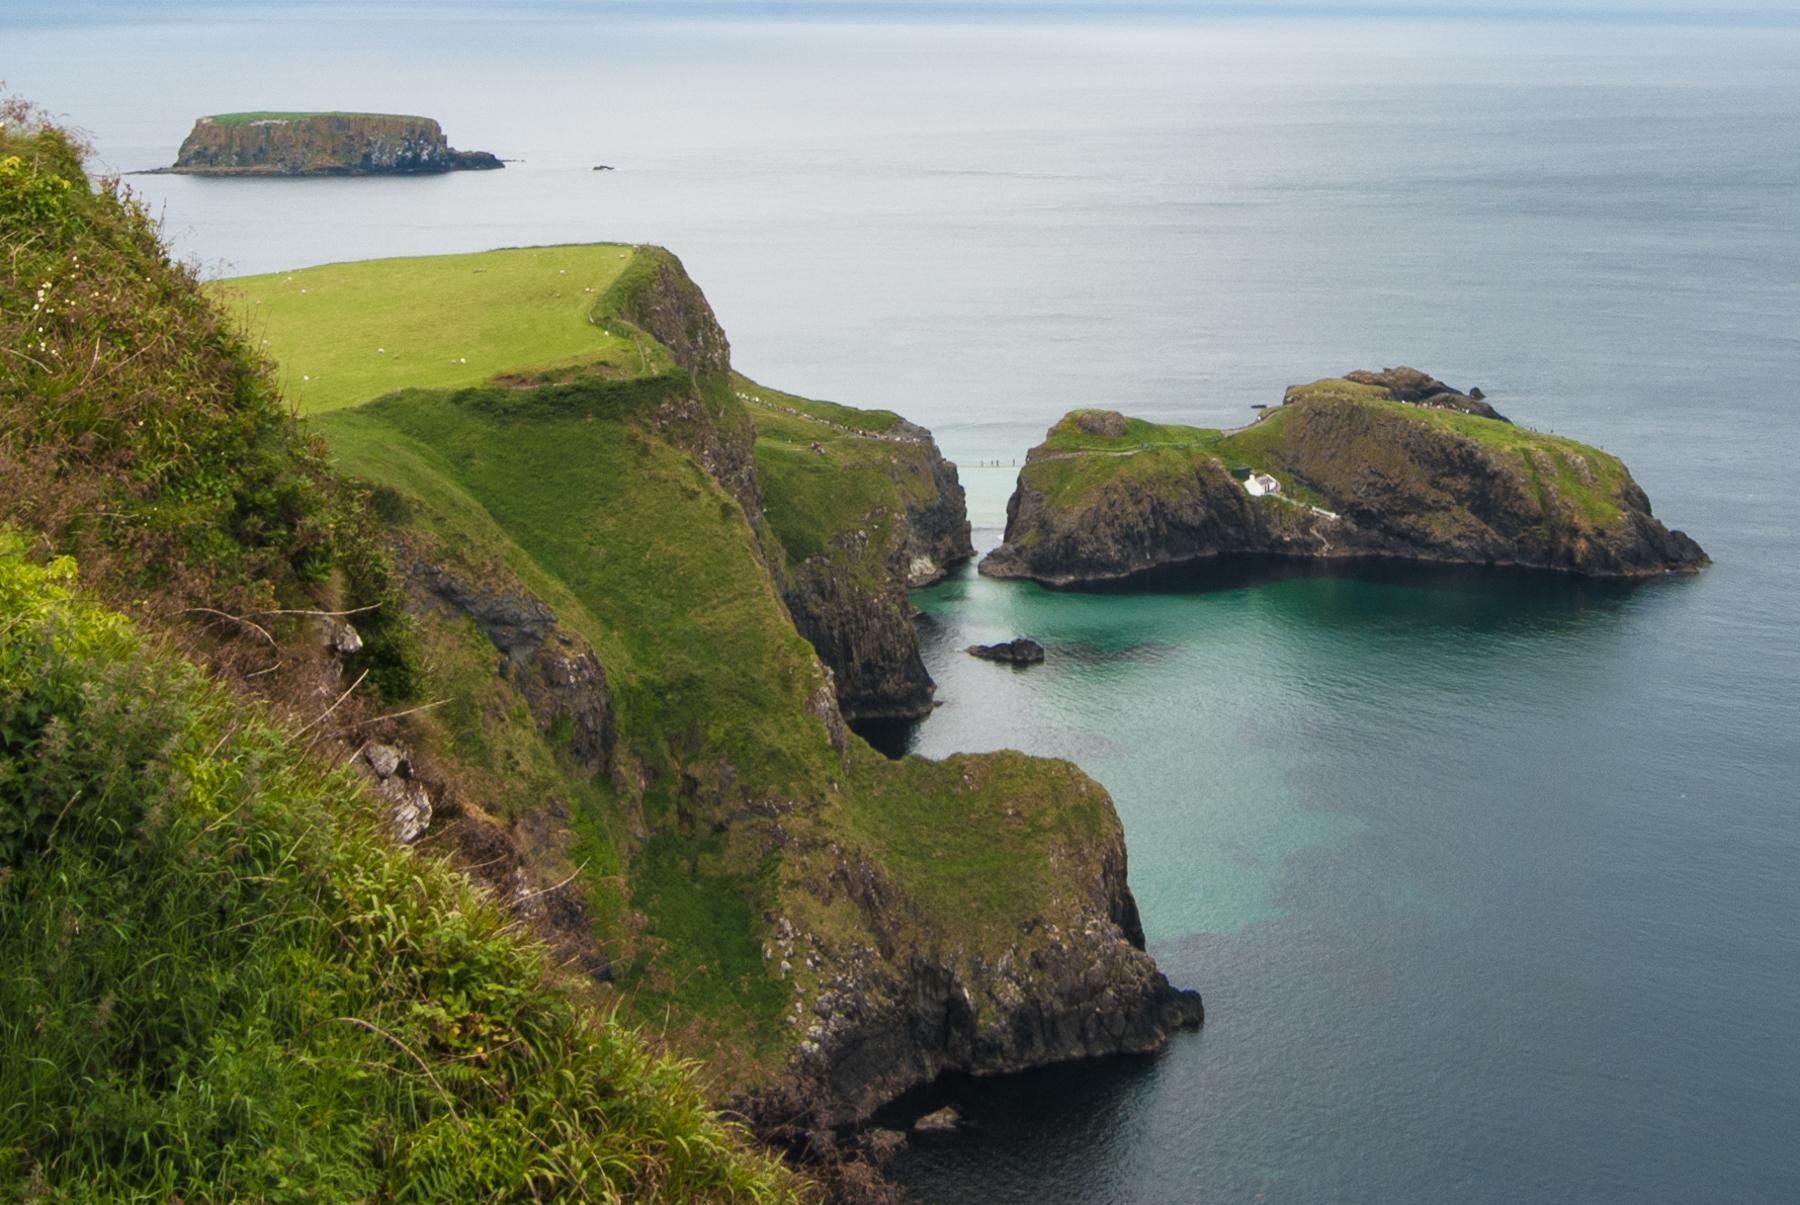 Kayak Tours Northern Ireland by Bout Yeh photographers - photo 2125